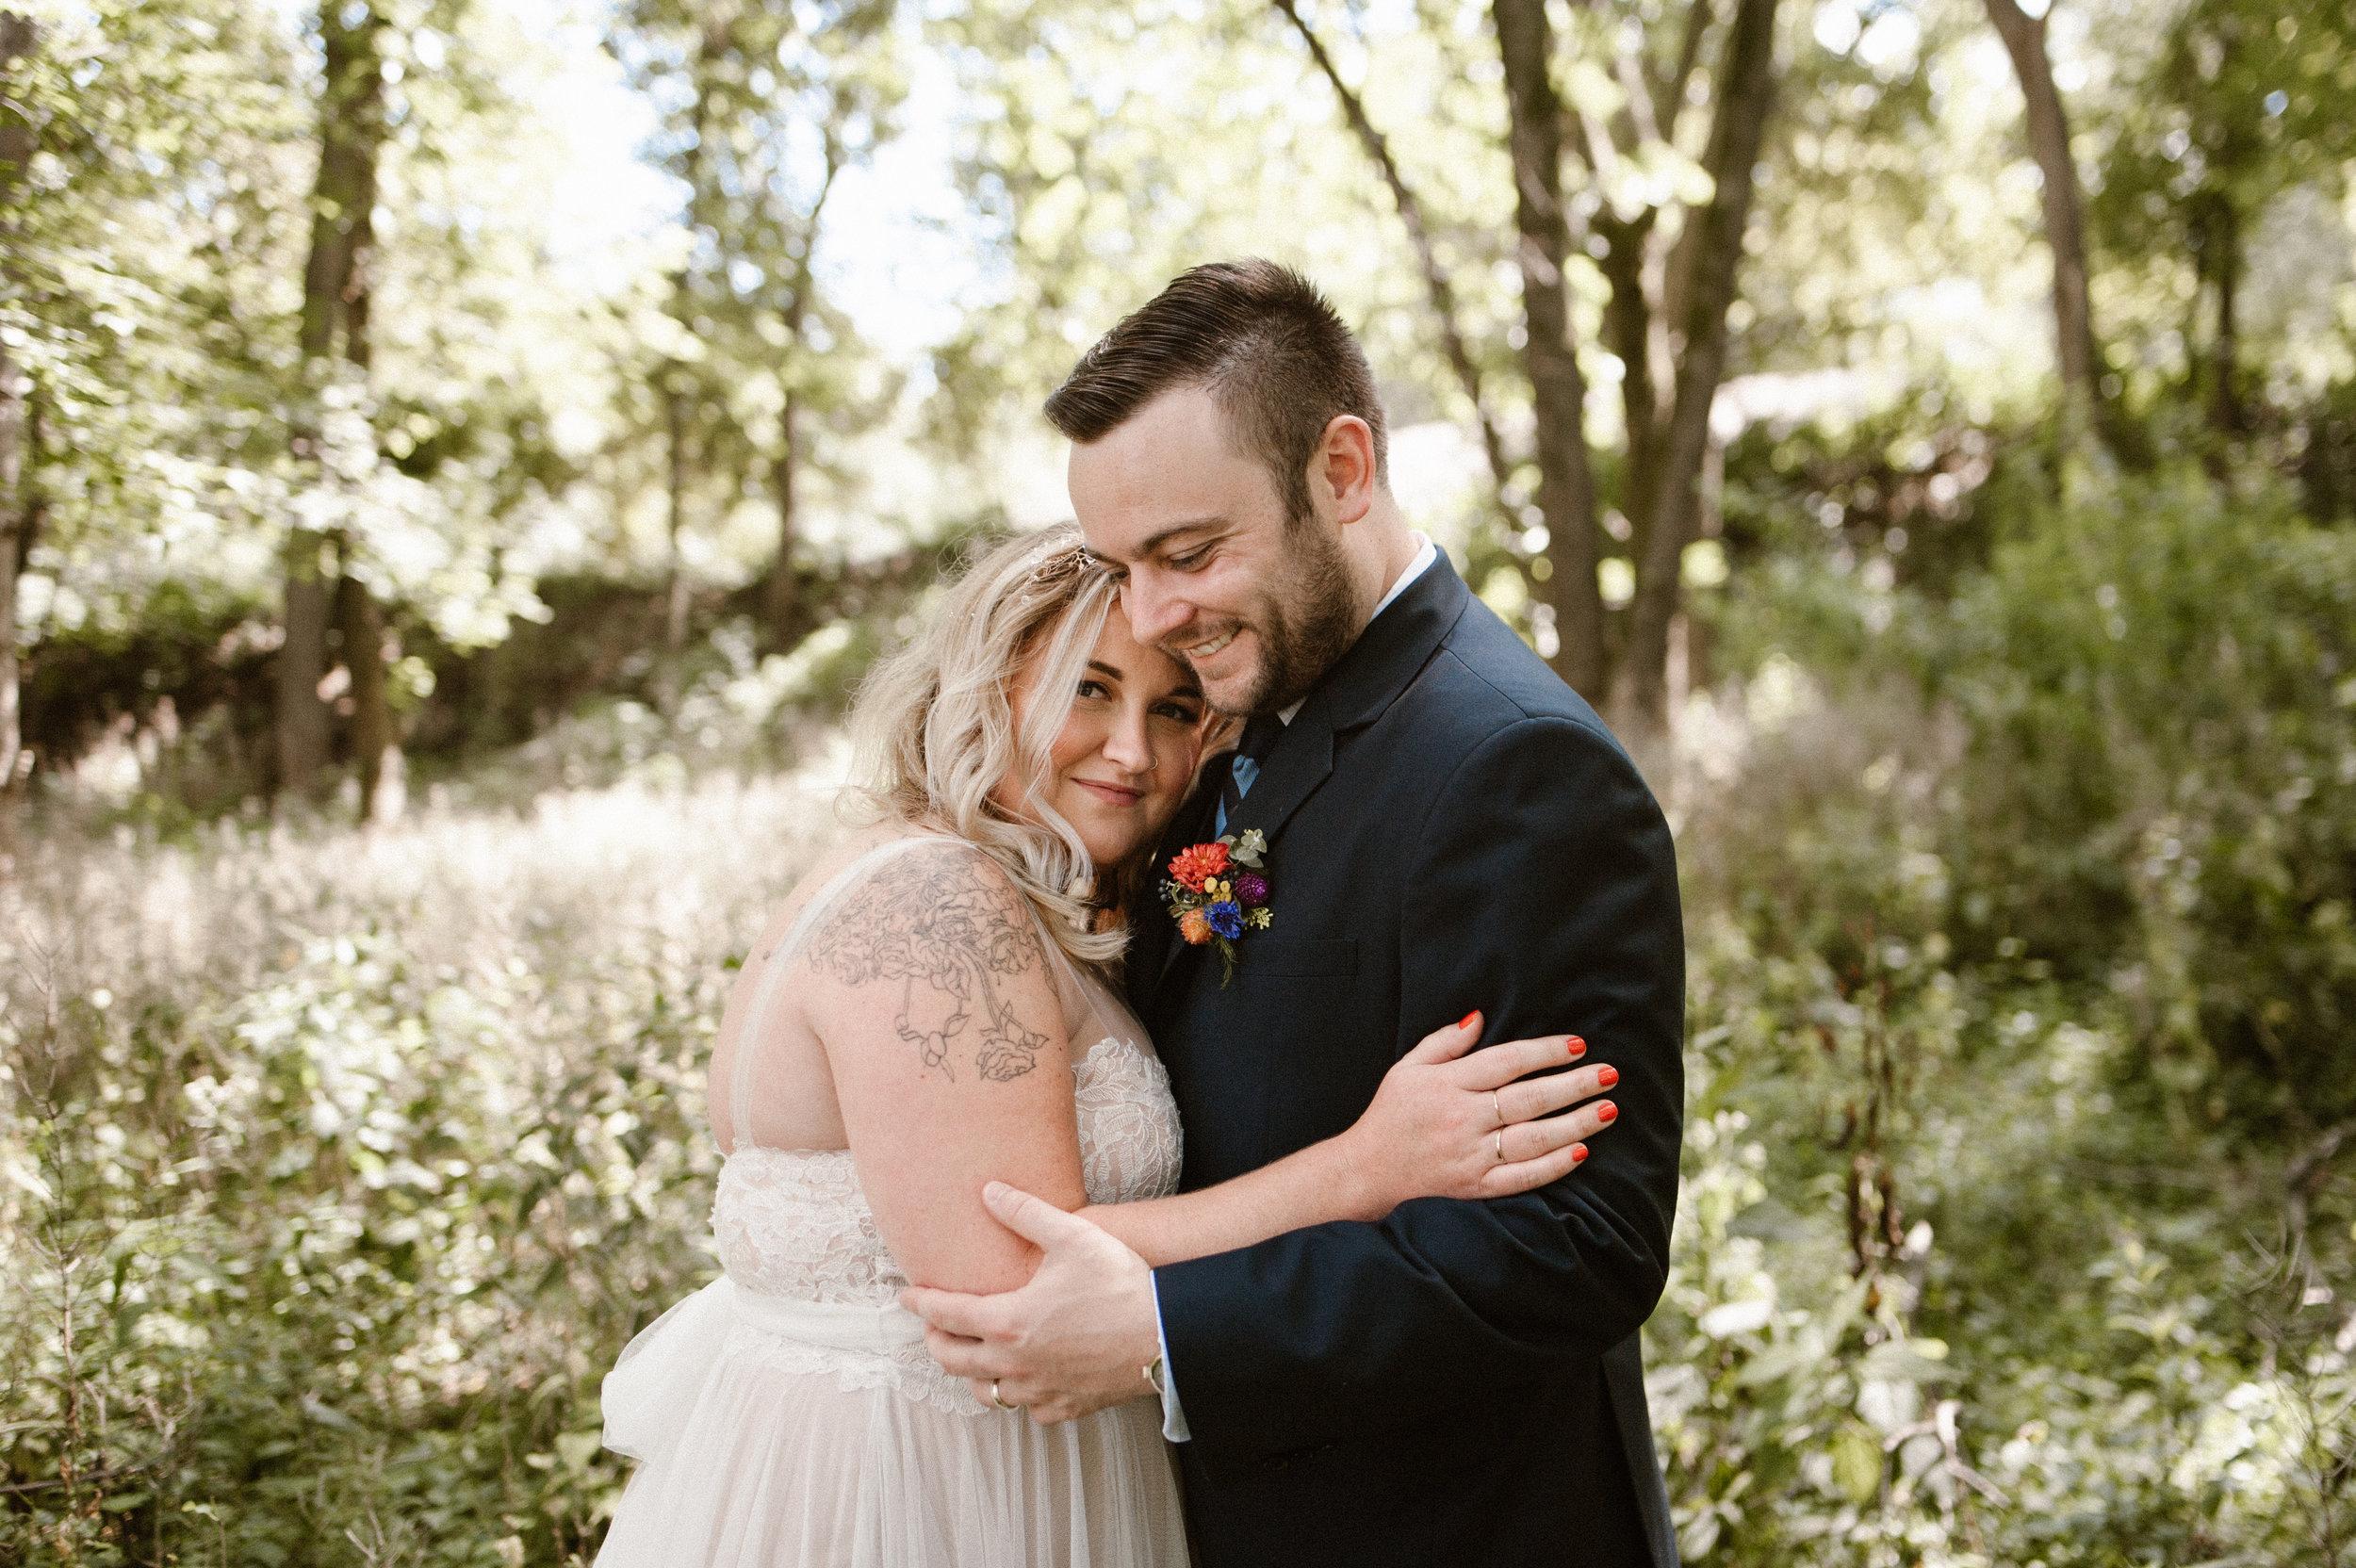 the-bees-knees-floral-brainerd-mn-minnesota-wedding-florist-floral-designer-flowers-bridal-twin-cities-minneapolis-sharayah-krautkremer-wildflower-weddings-vintage-decor-rentals